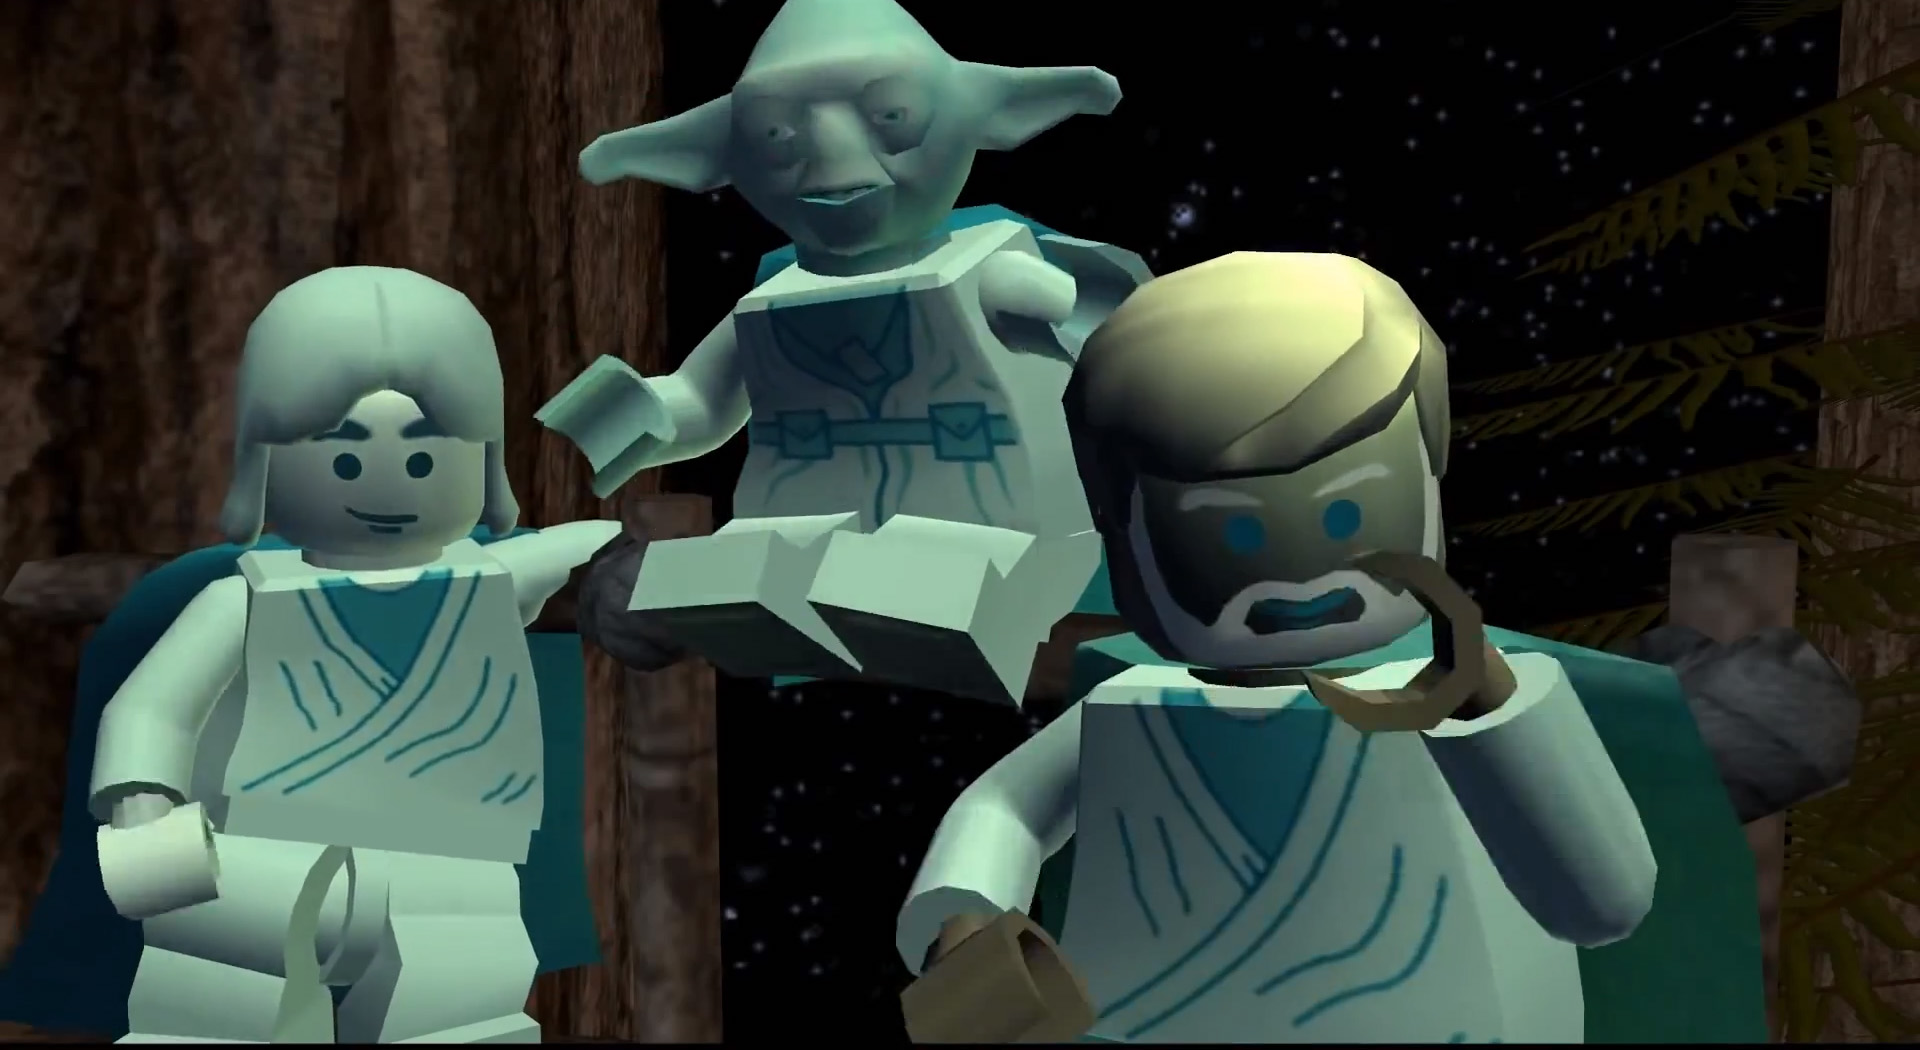 Custom anakin yoda and obi wan ghosts brickipedia the - Lego star wars anakin ghost ...